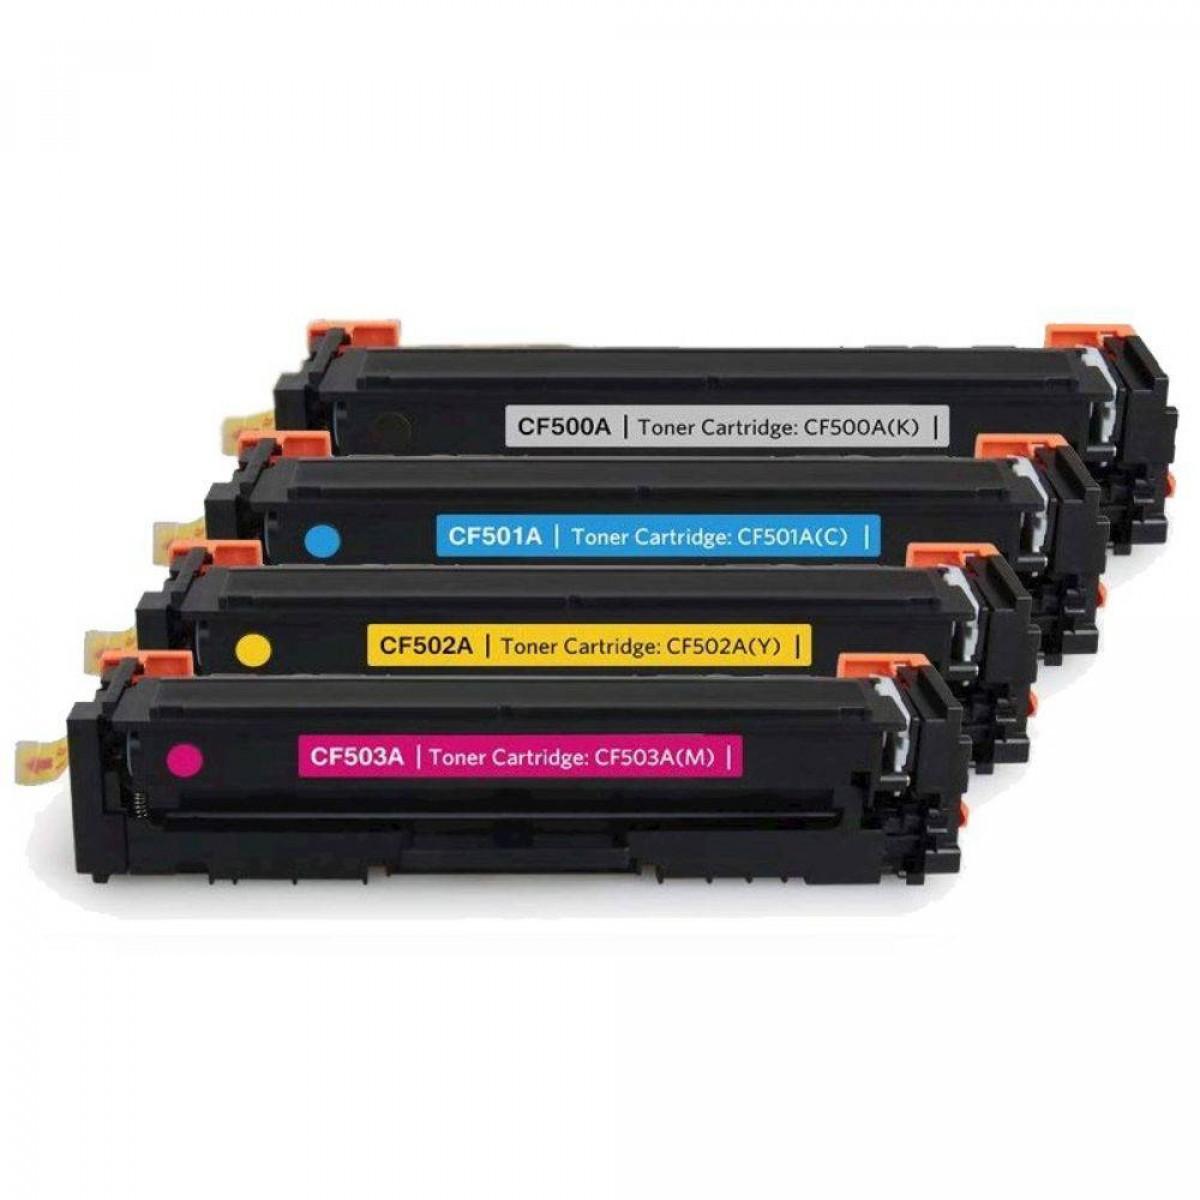 Foto 1 - TONER COMBO HP CF500A | CF501A | CF502A | CF503A |Cartucho Compatível| Cor: Todas as Cores